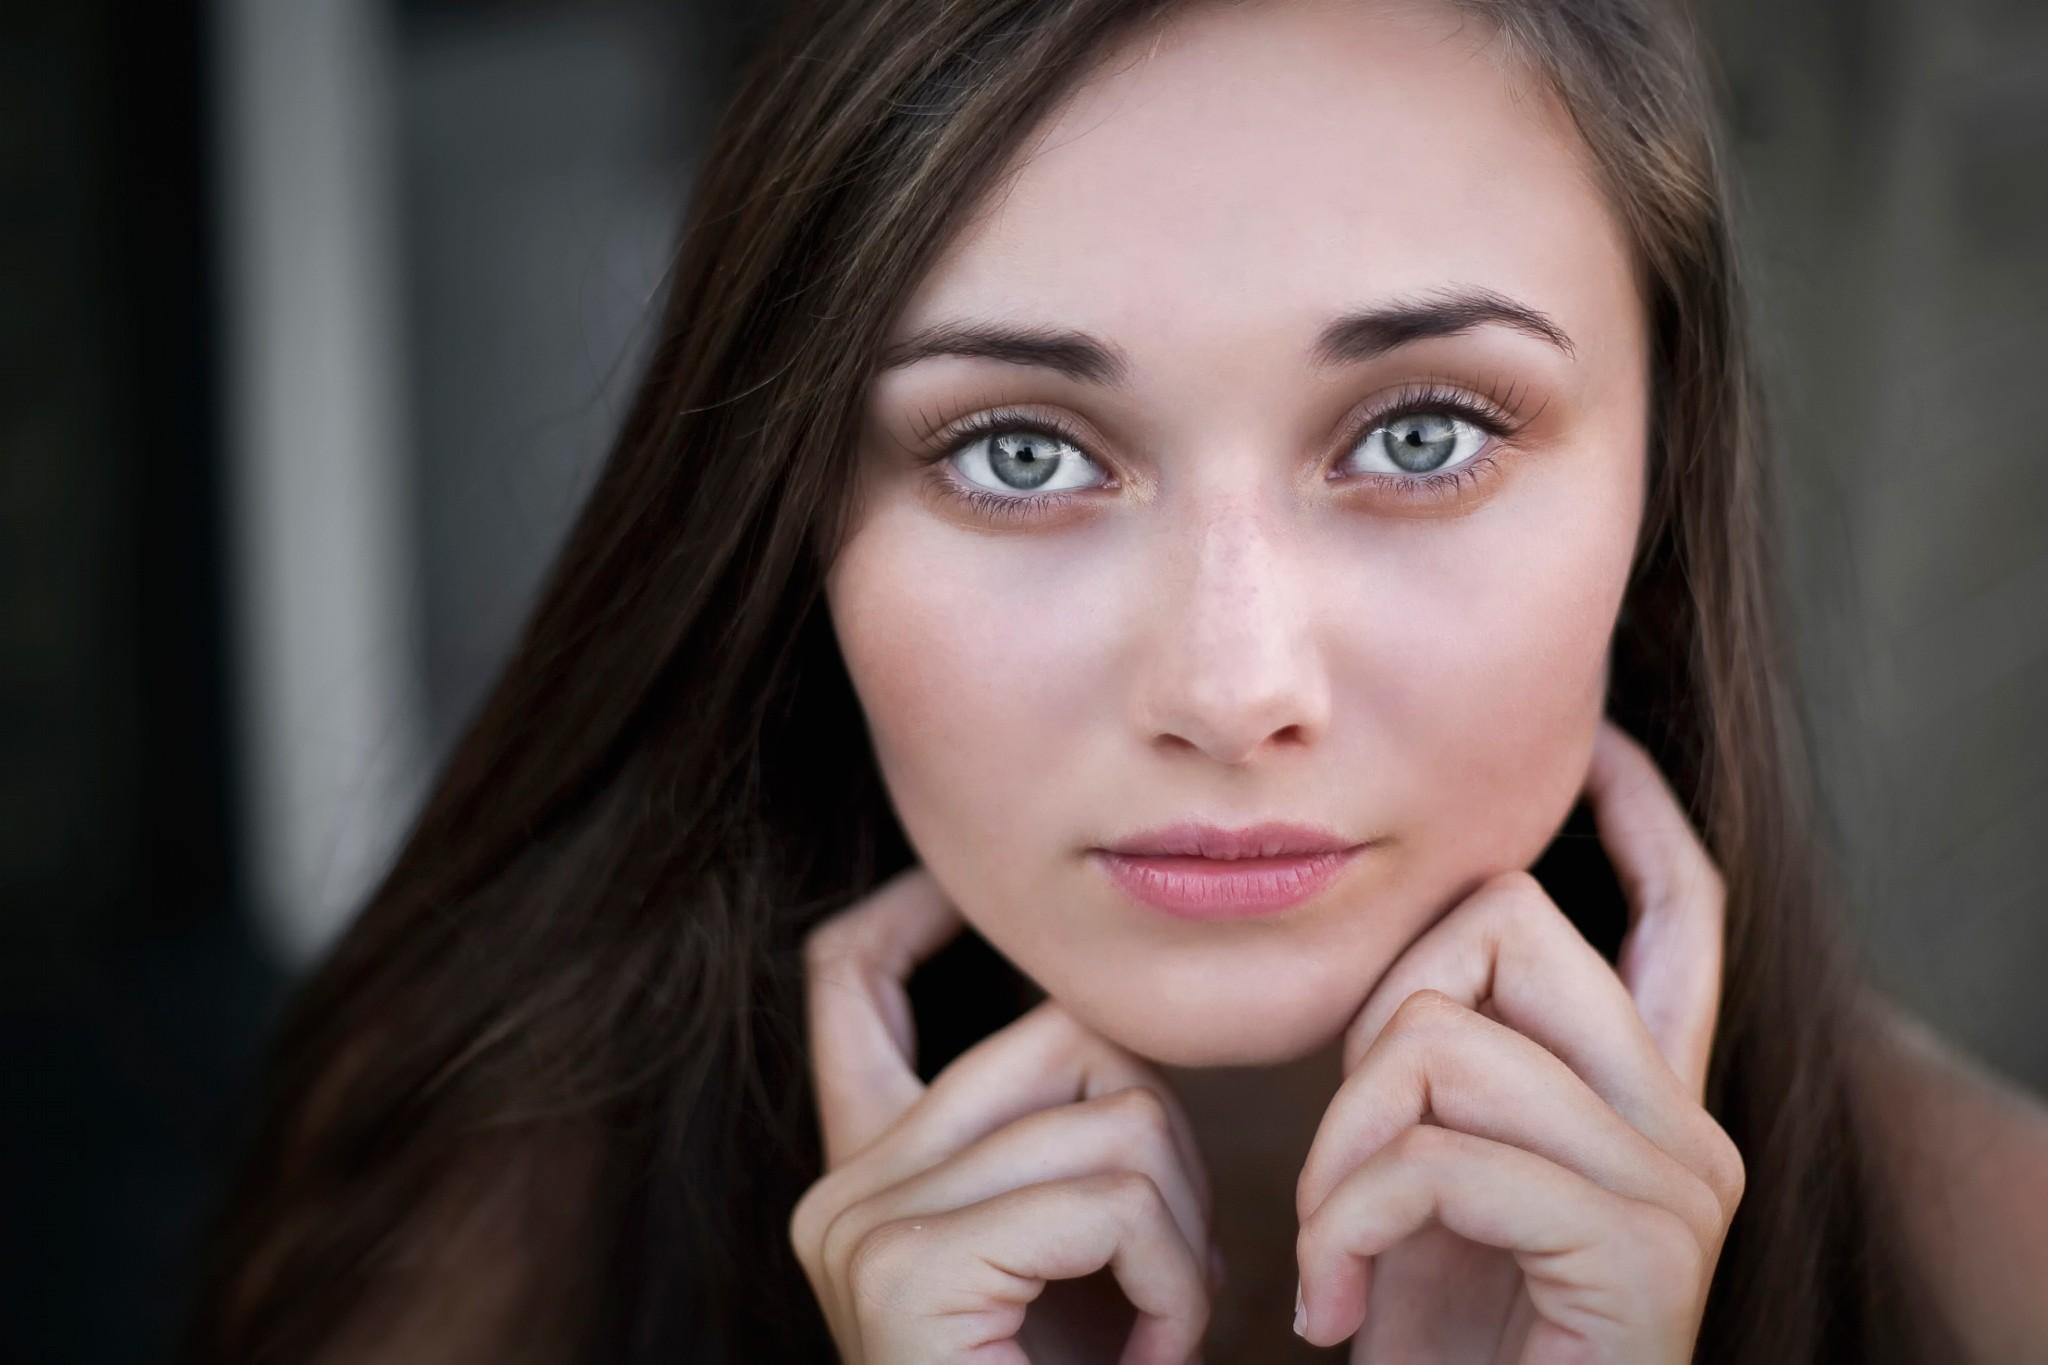 Картинки девушек лицо